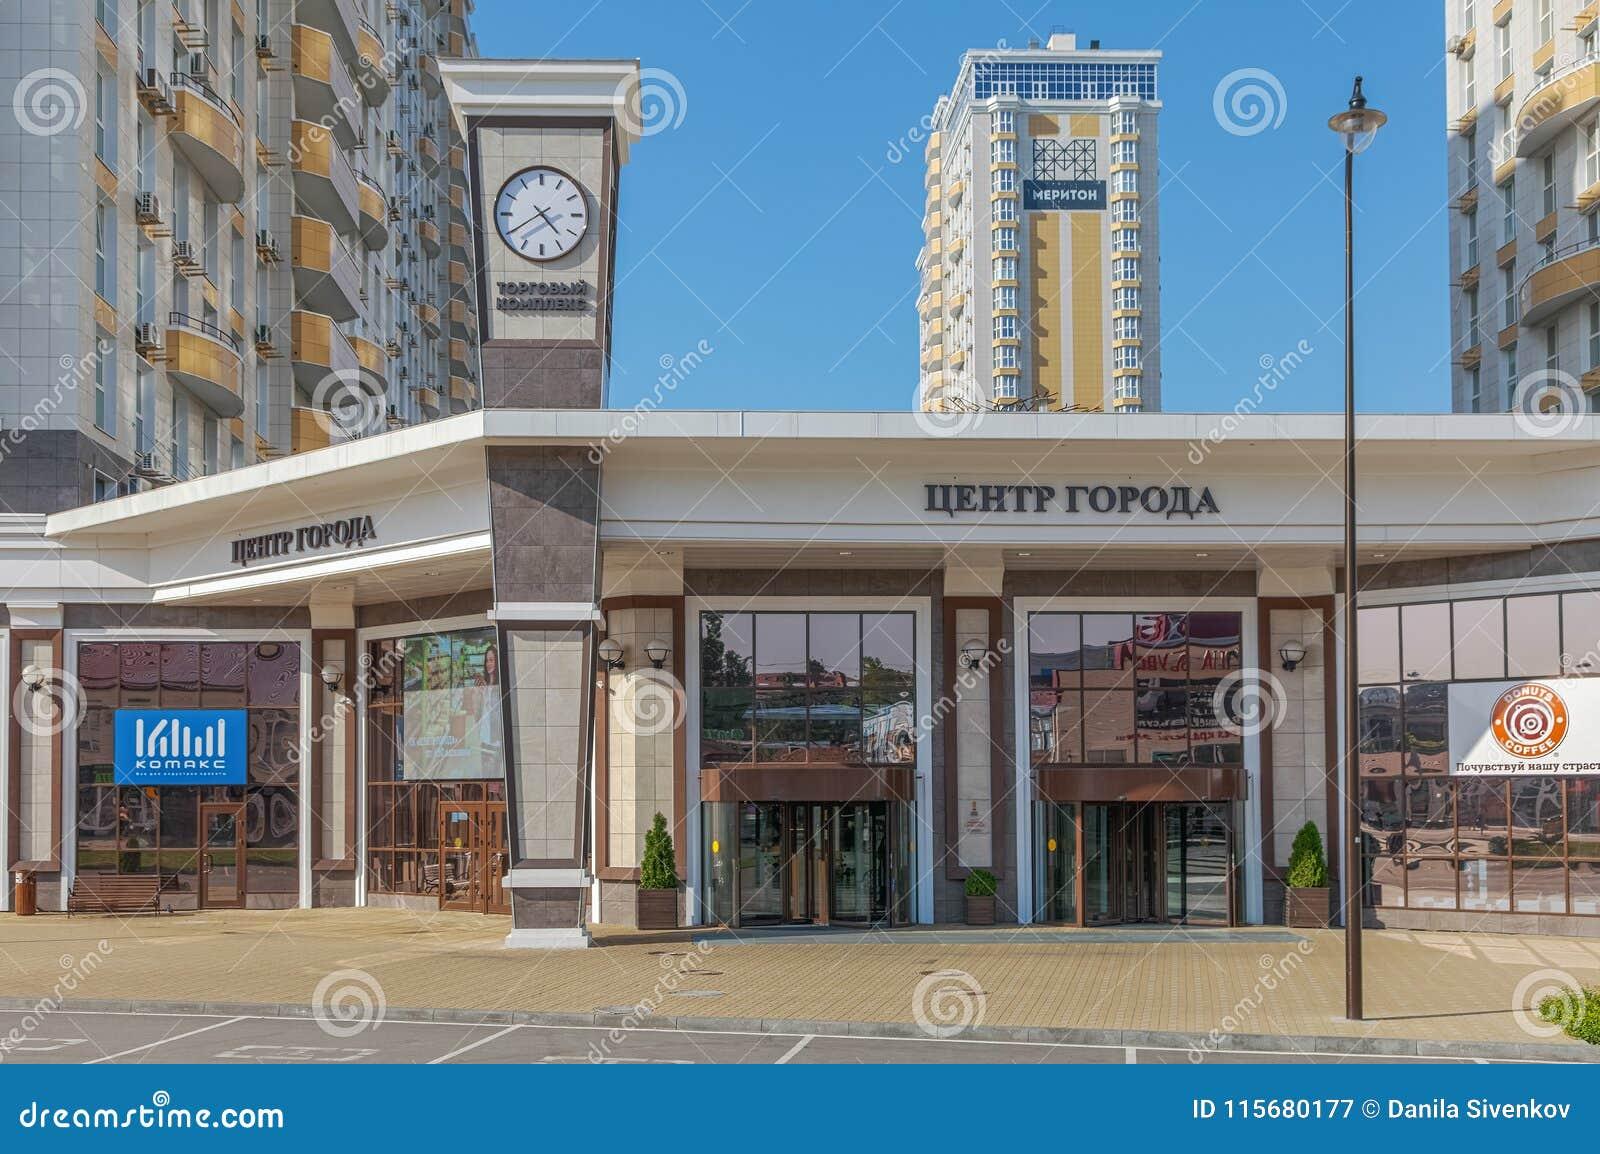 Krasnodar Russia May 2 2017 Shopping Center City Center Stock Image Image Of Skyscraper Cityscape 115680177